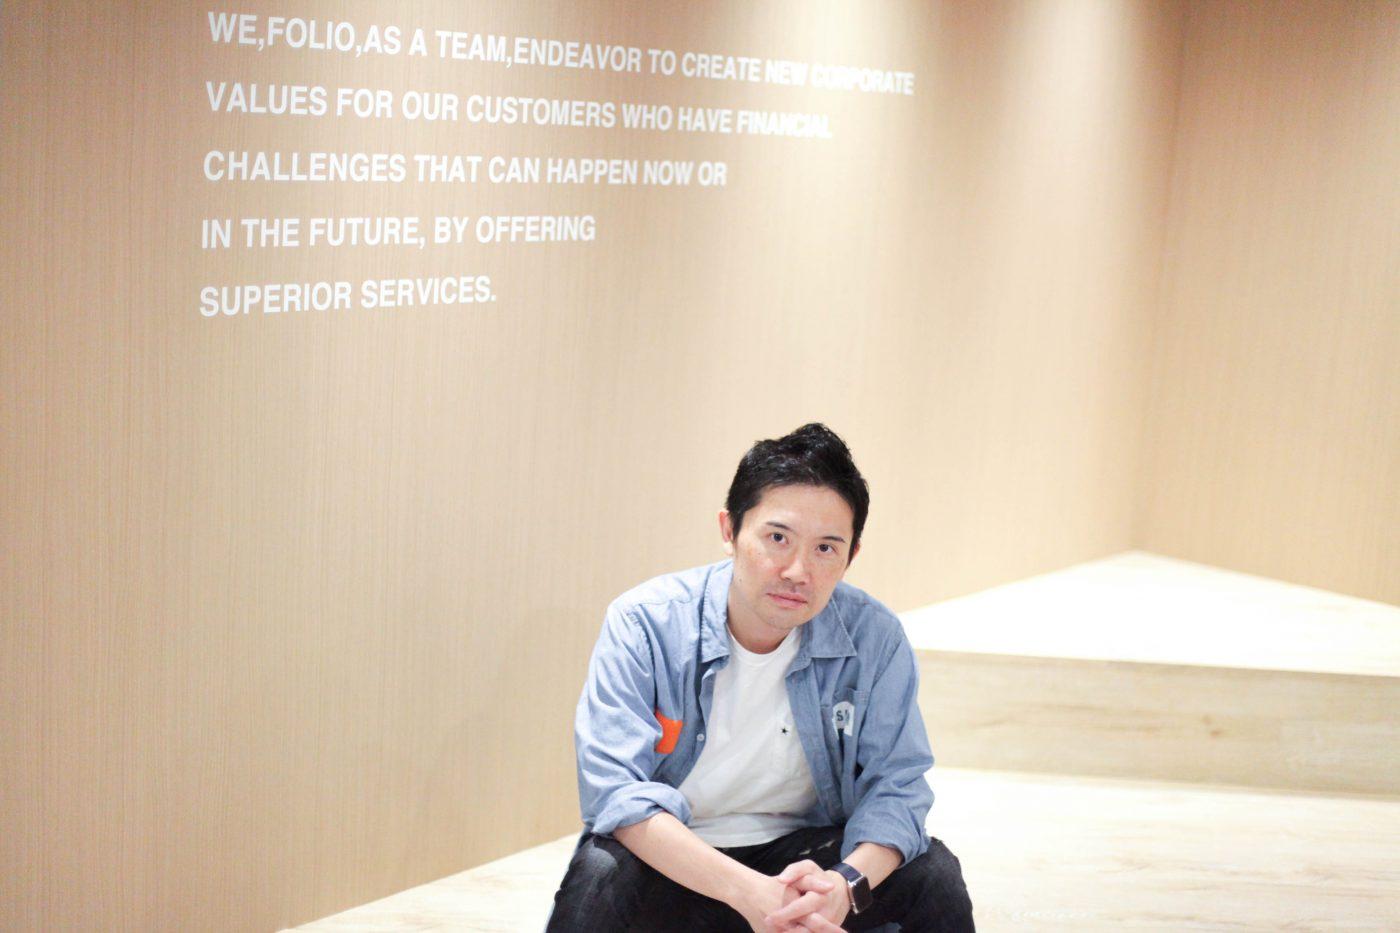 FOLIO 甲斐CEO インタビュー